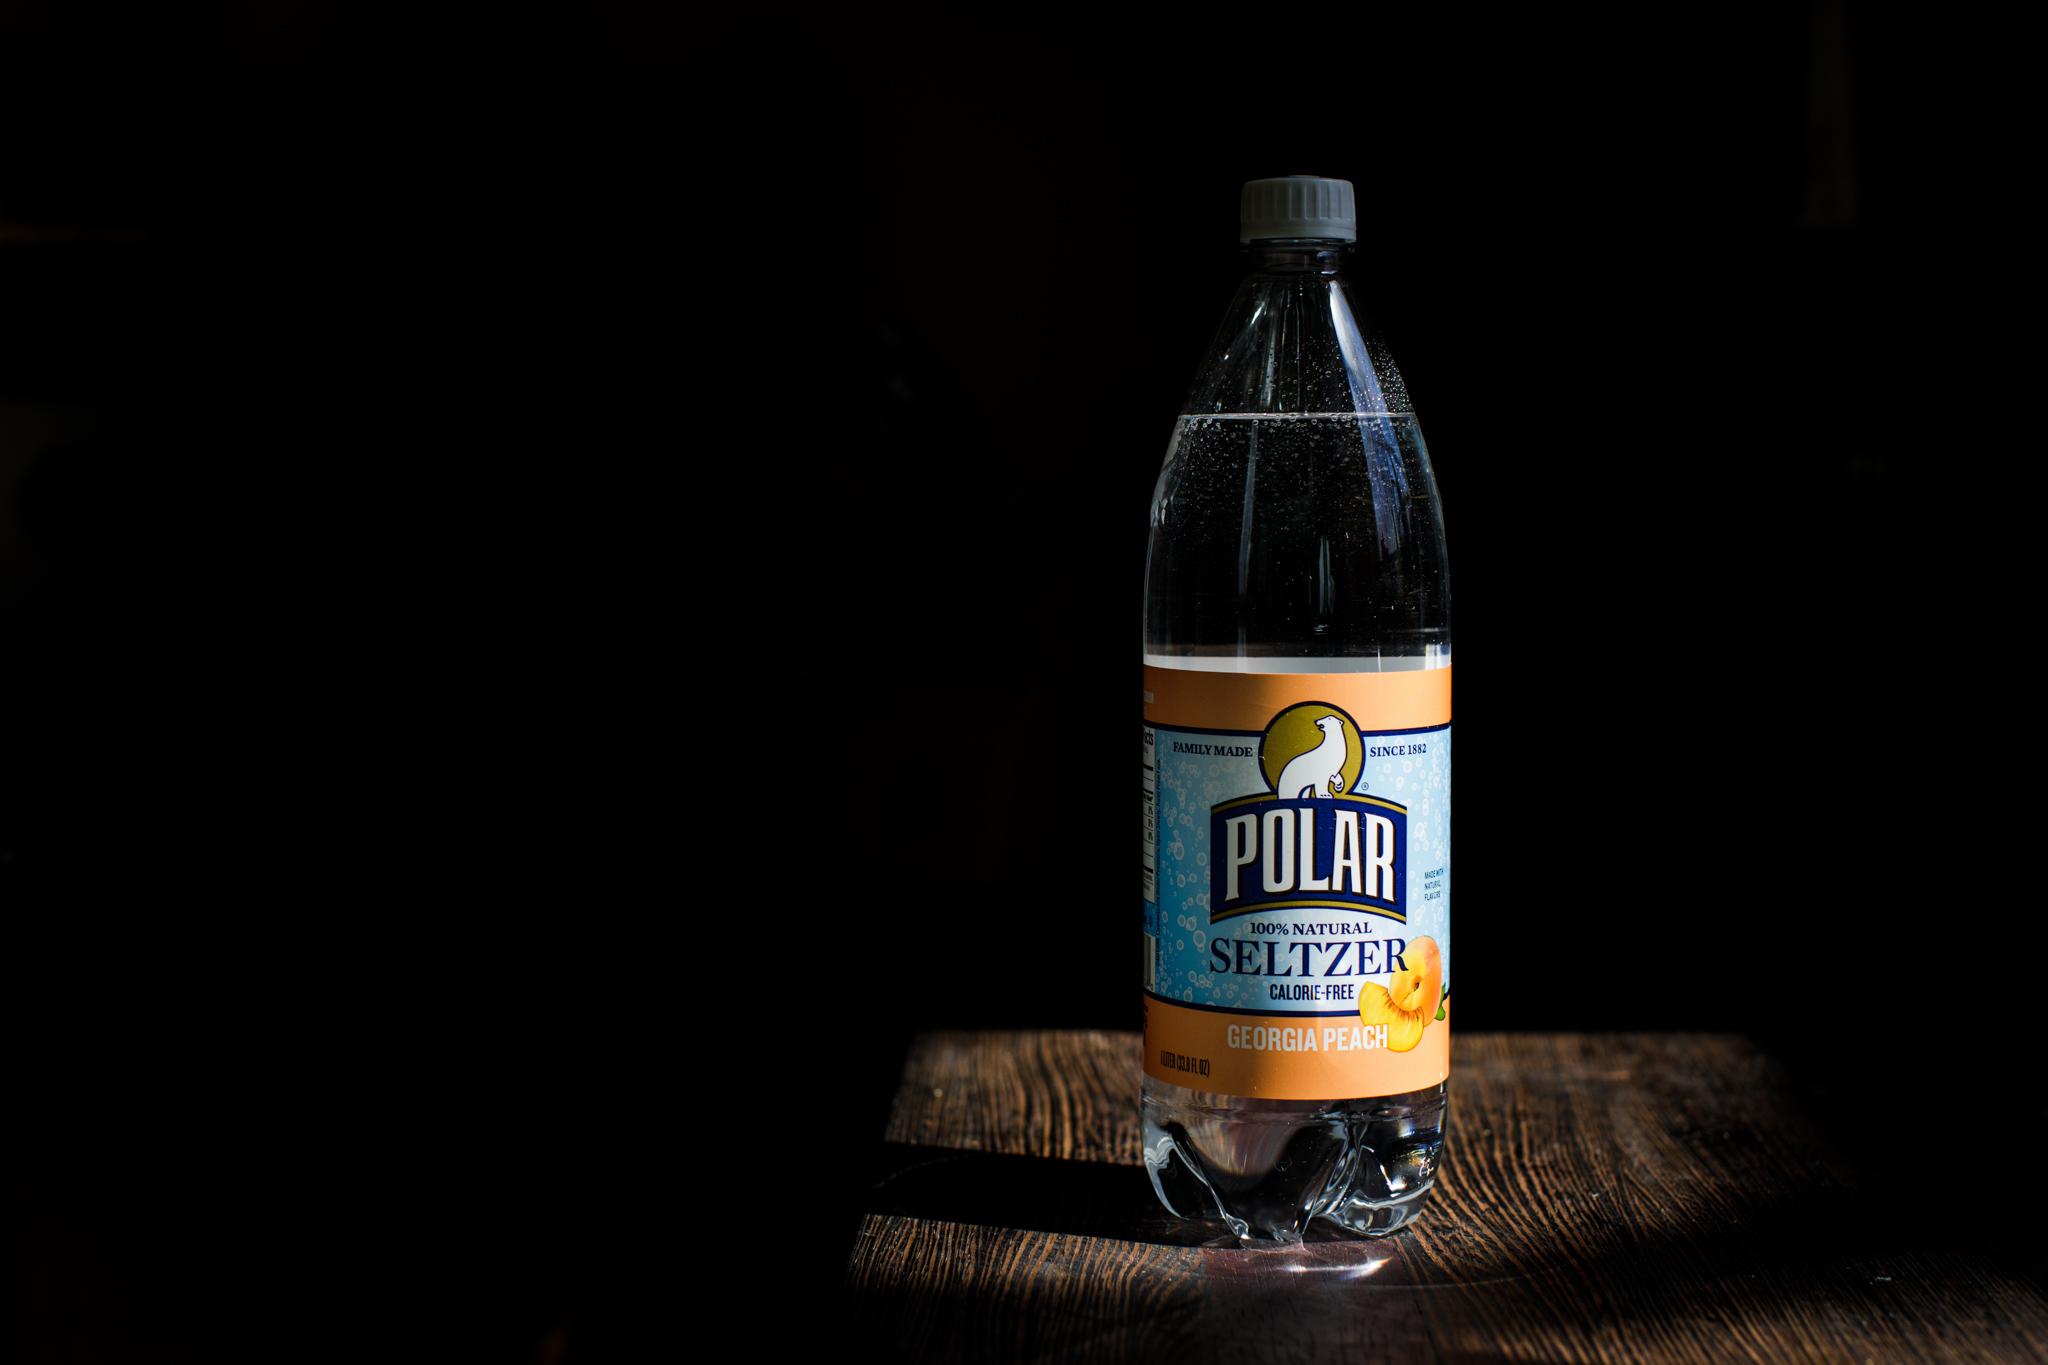 Peach flavored Polar seltzer